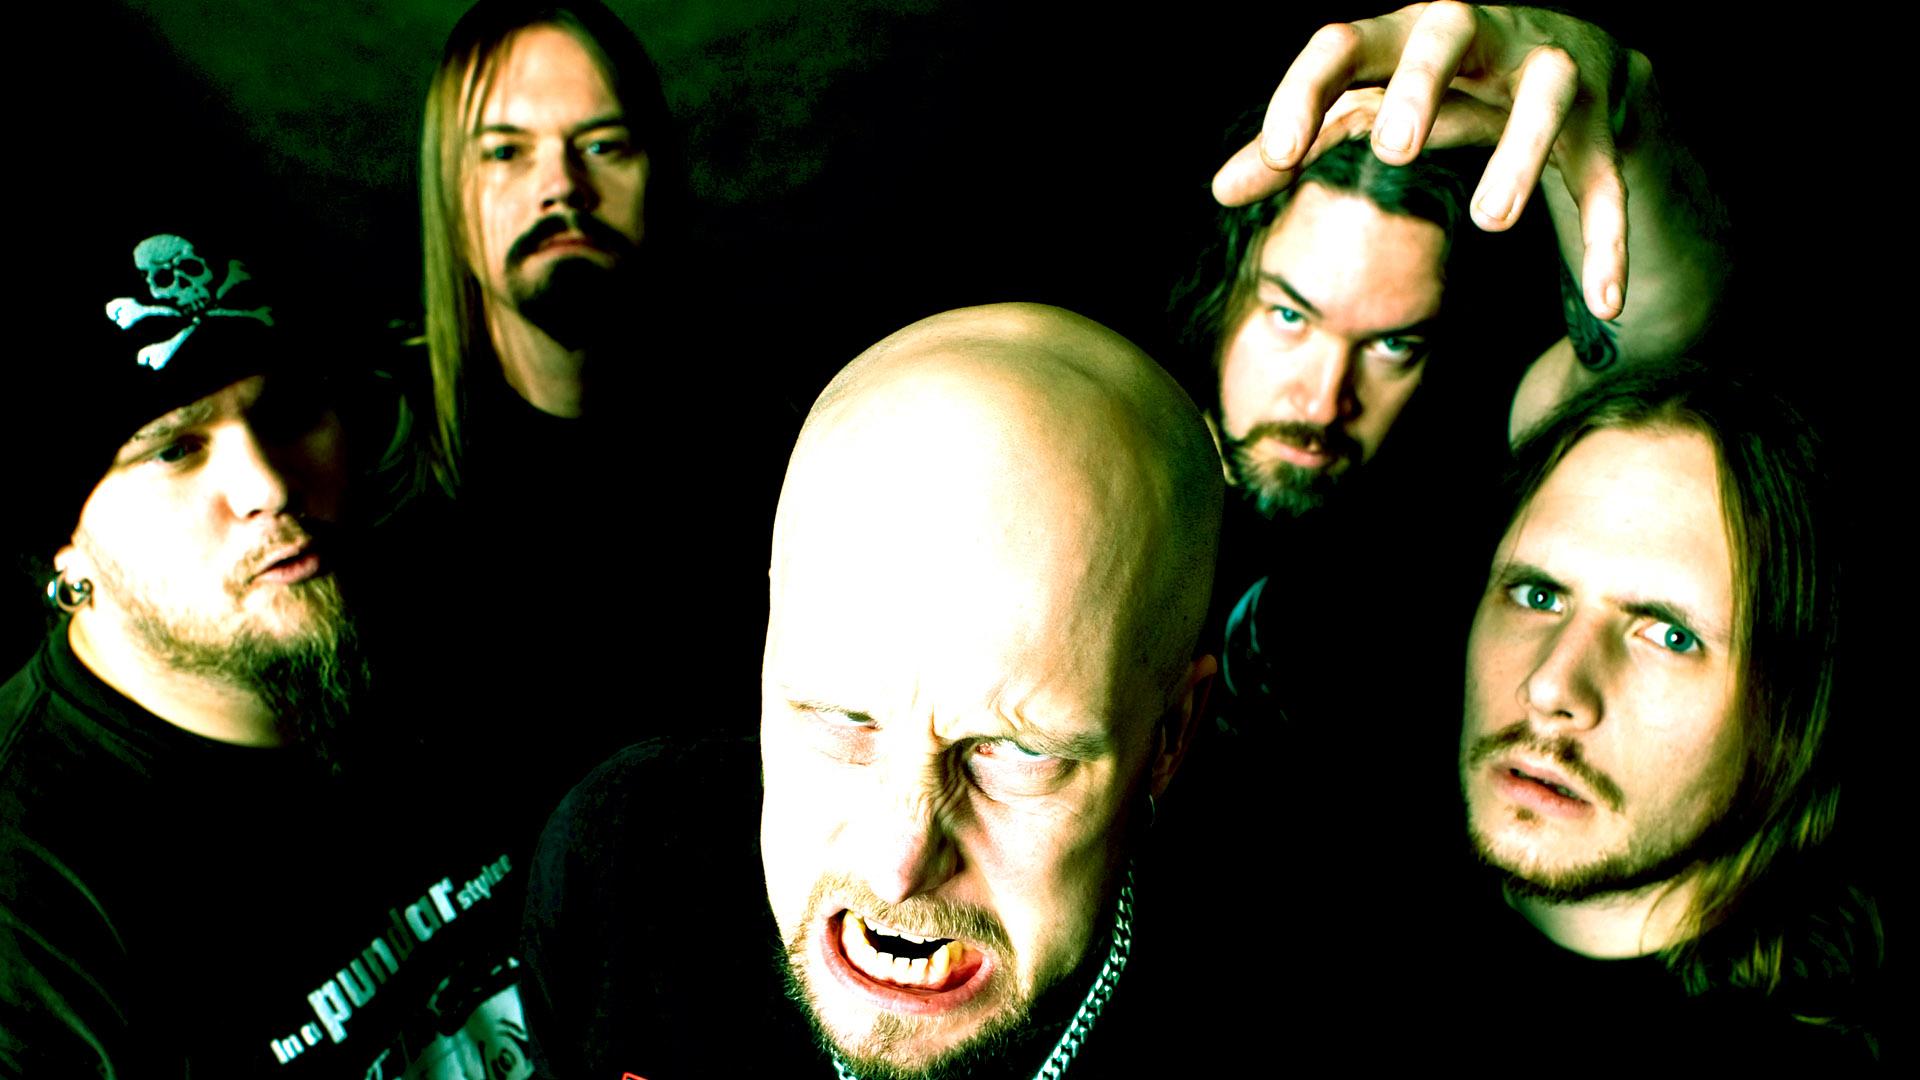 Meshuggah backdrop wallpaper 1920x1080